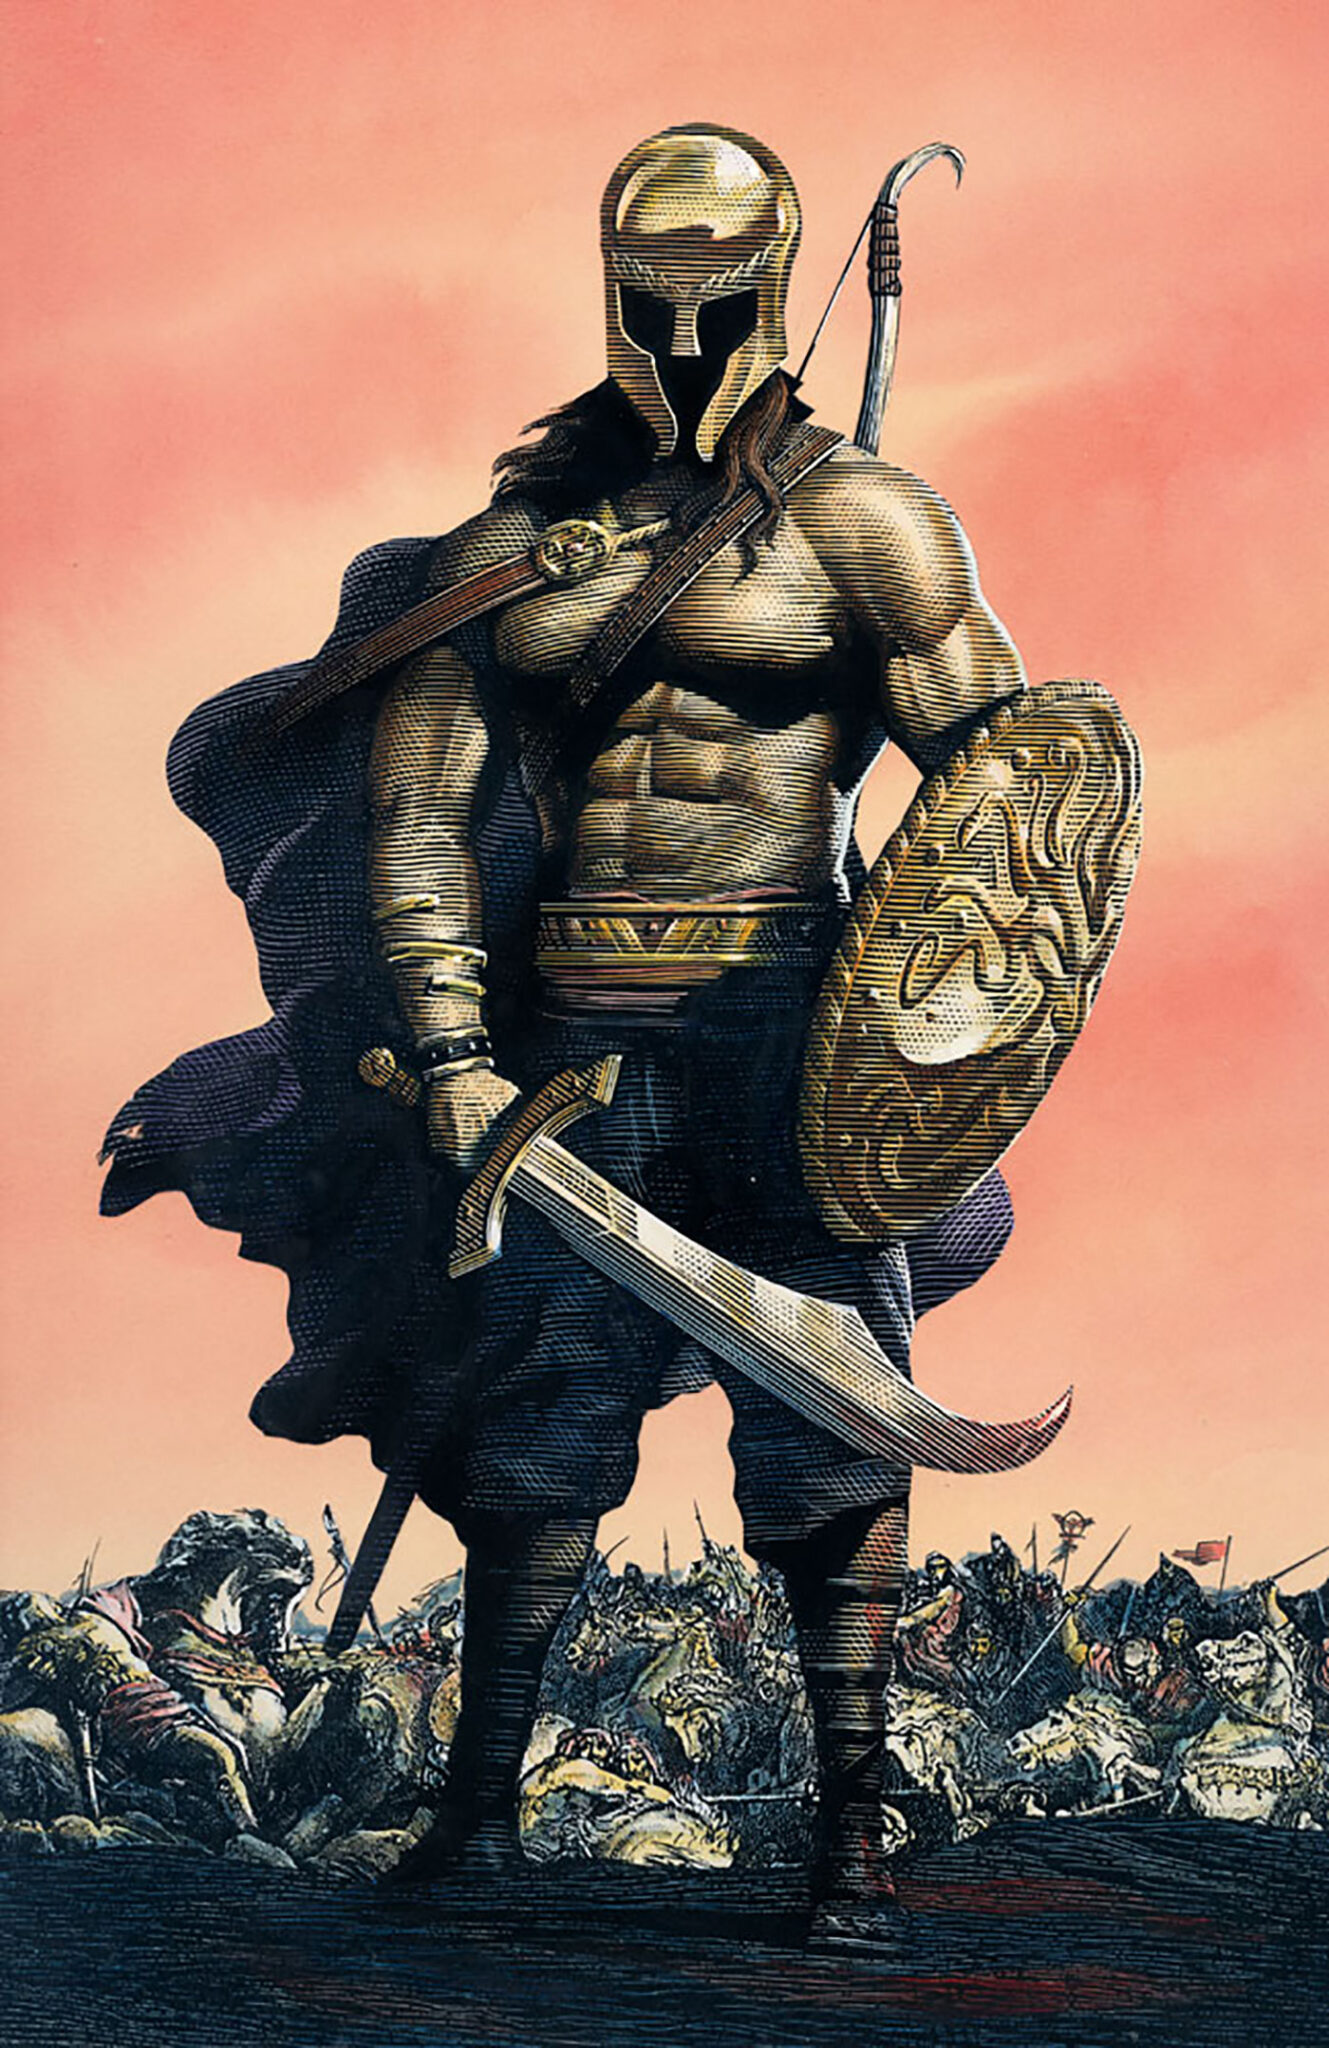 Richard Solomon - Mark-Summers-318-Warrior-color